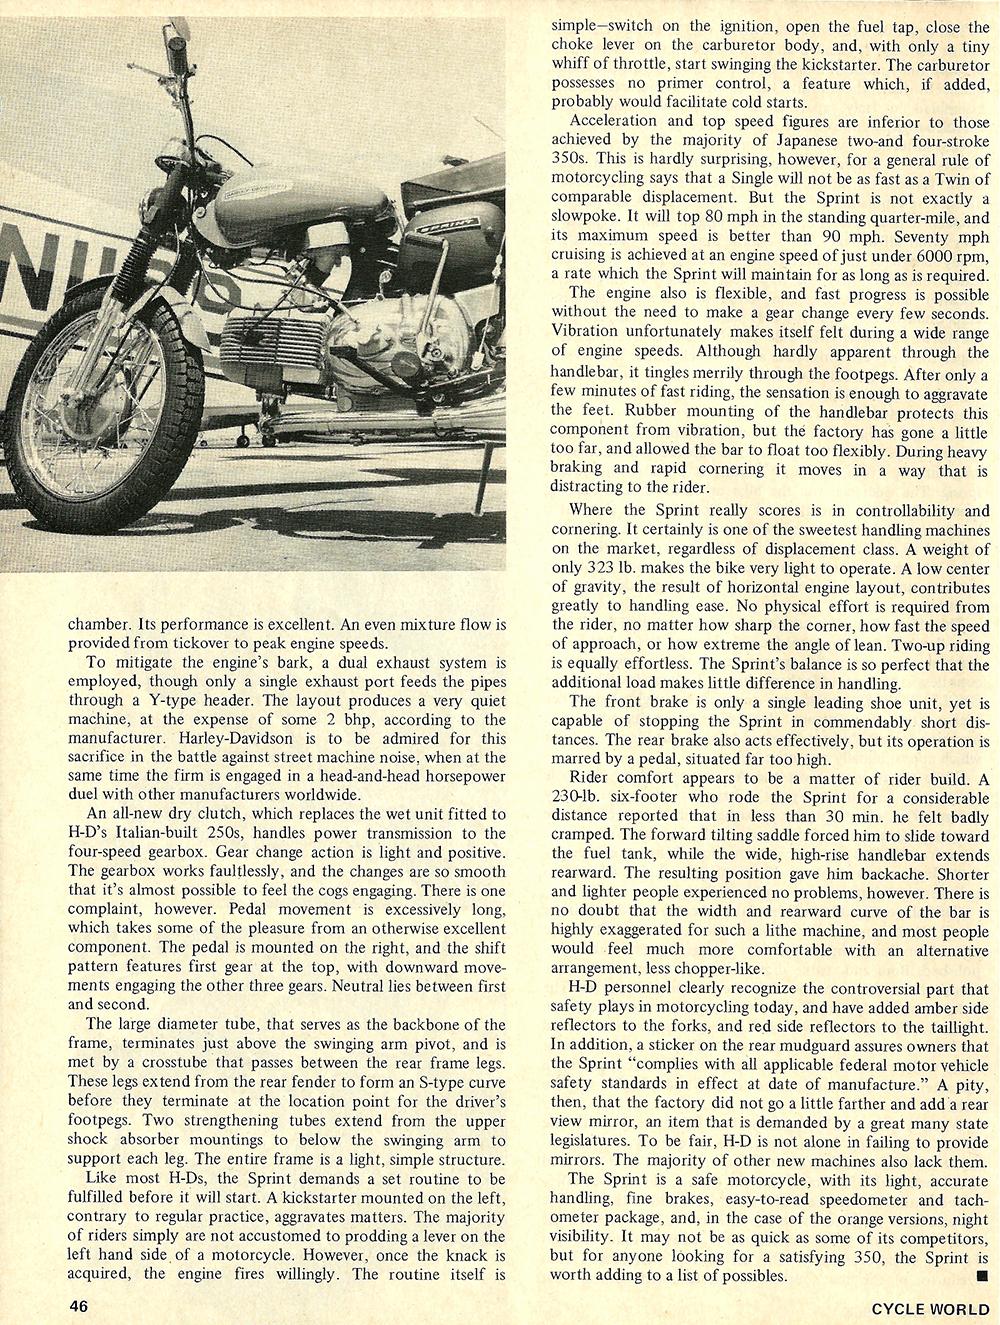 1968 Harley Sprint ss 350 road test 03.jpg